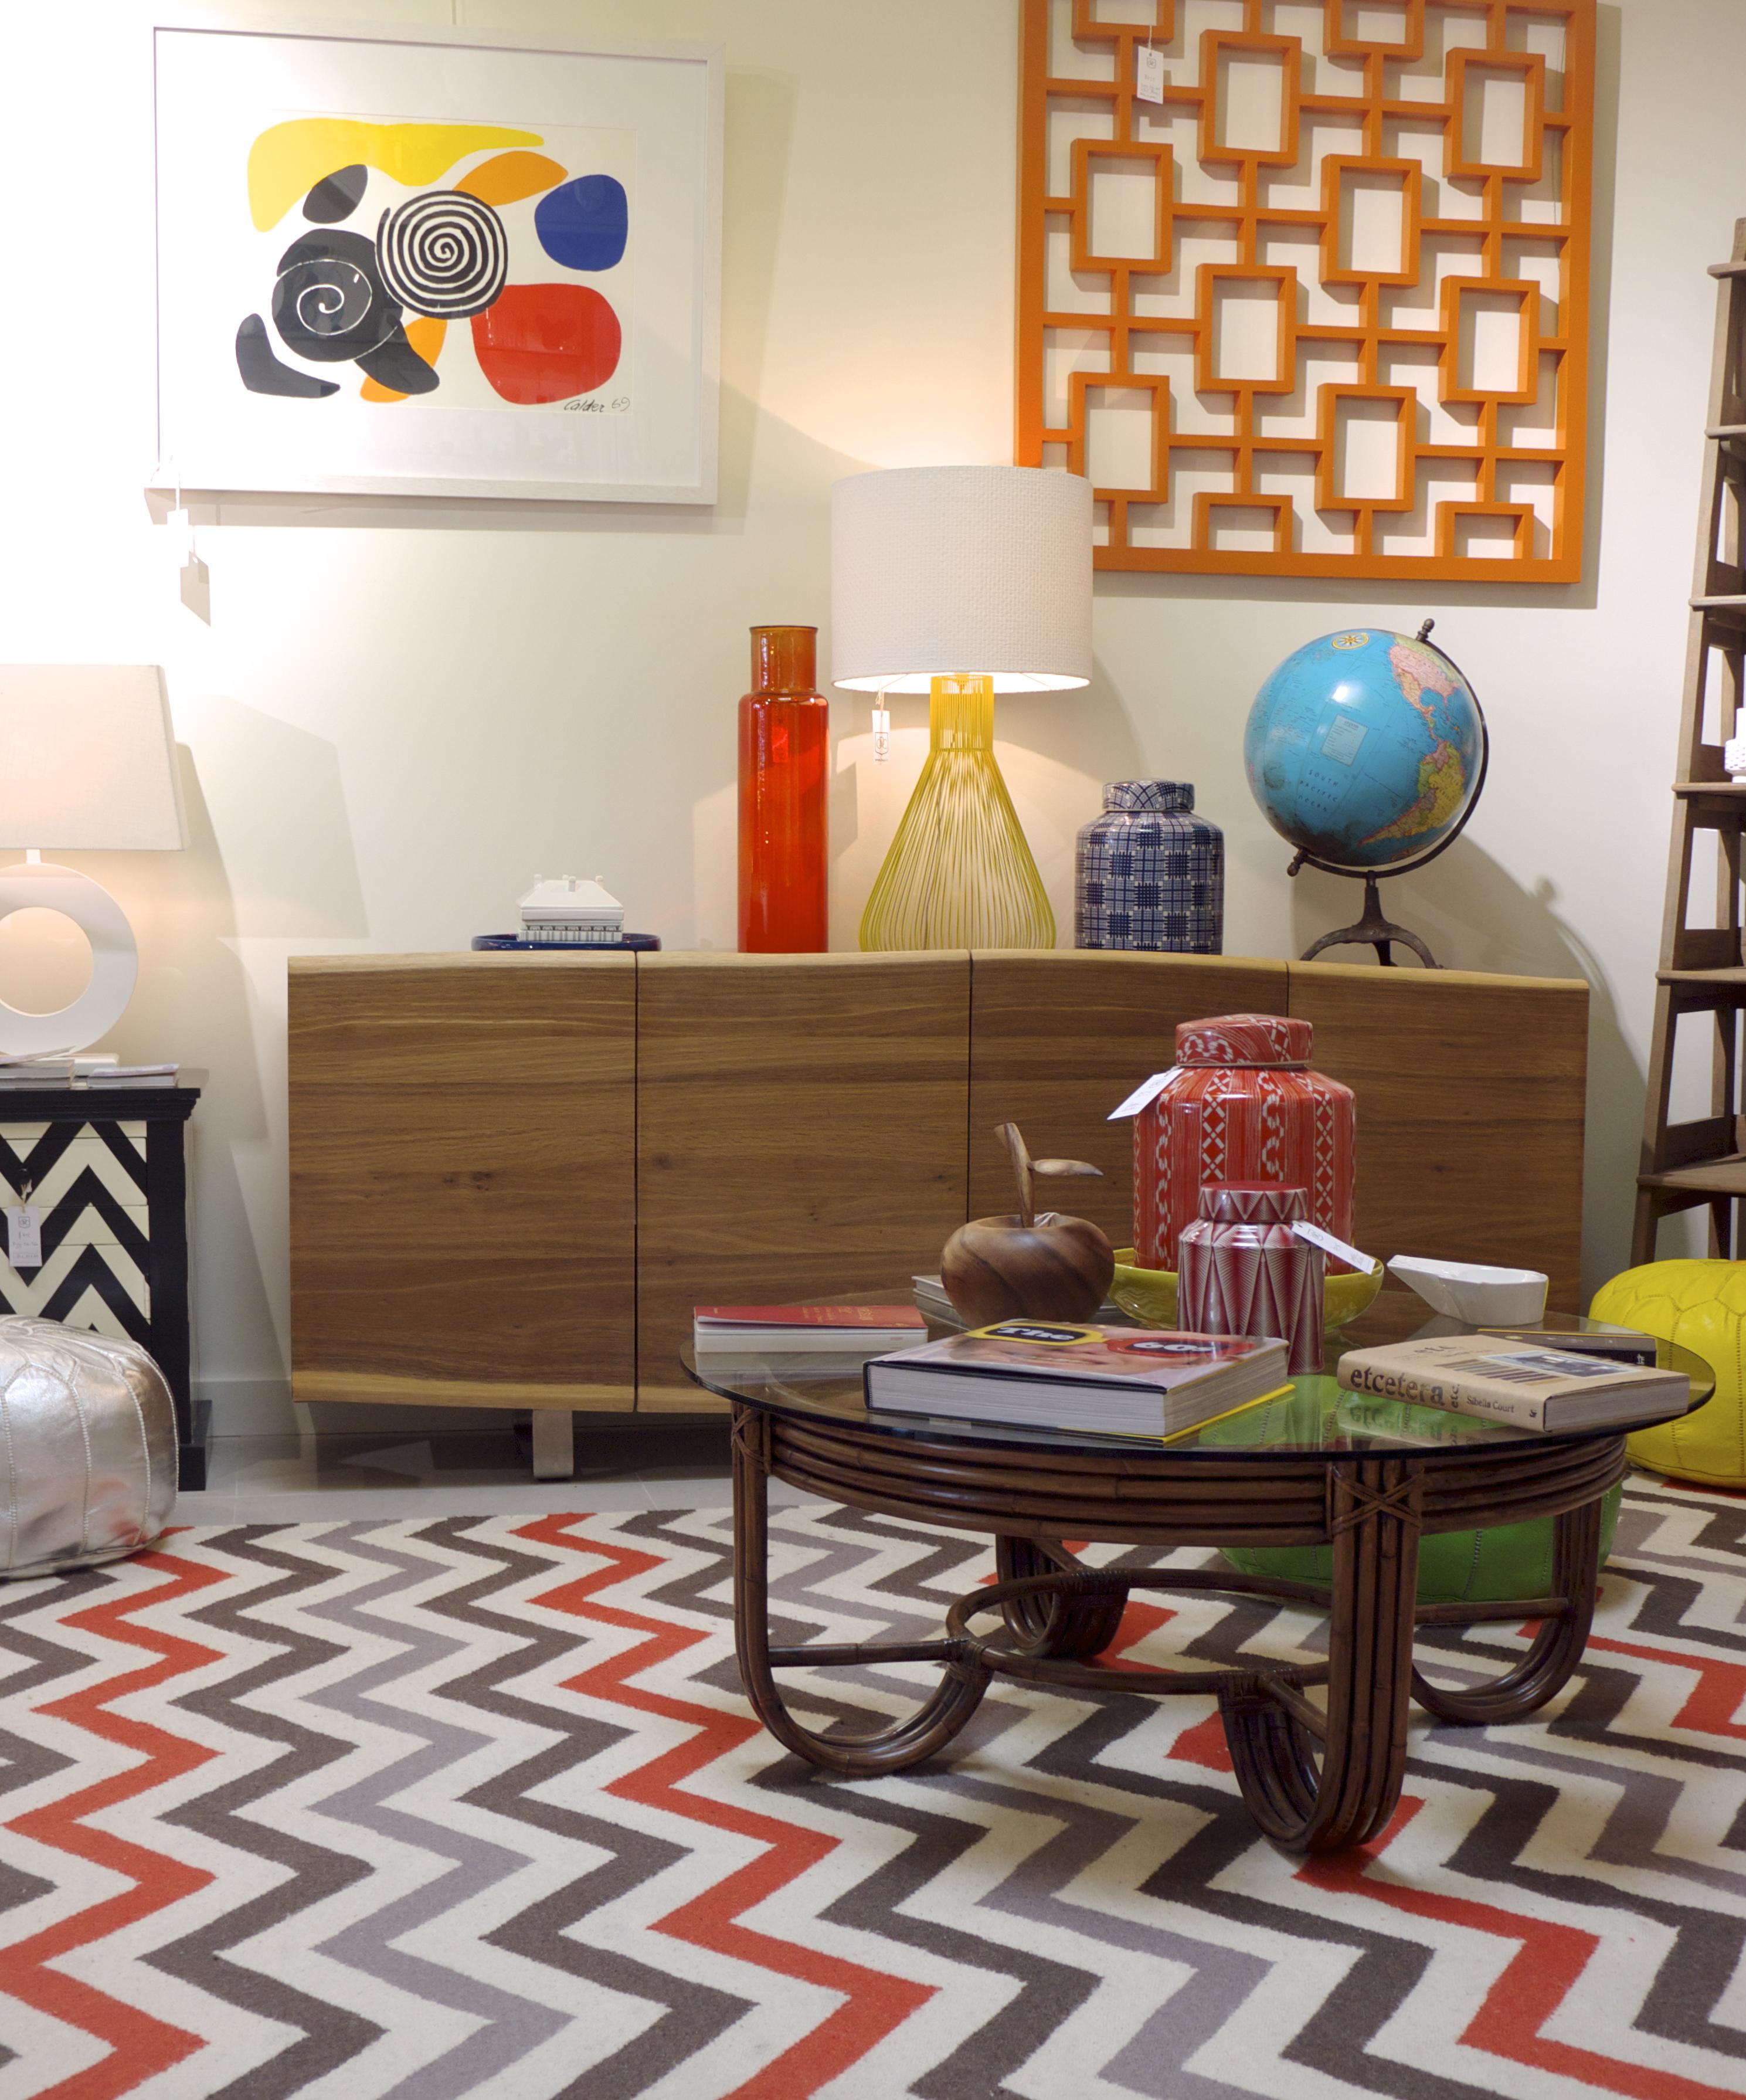 Opus Design - Paddington Store